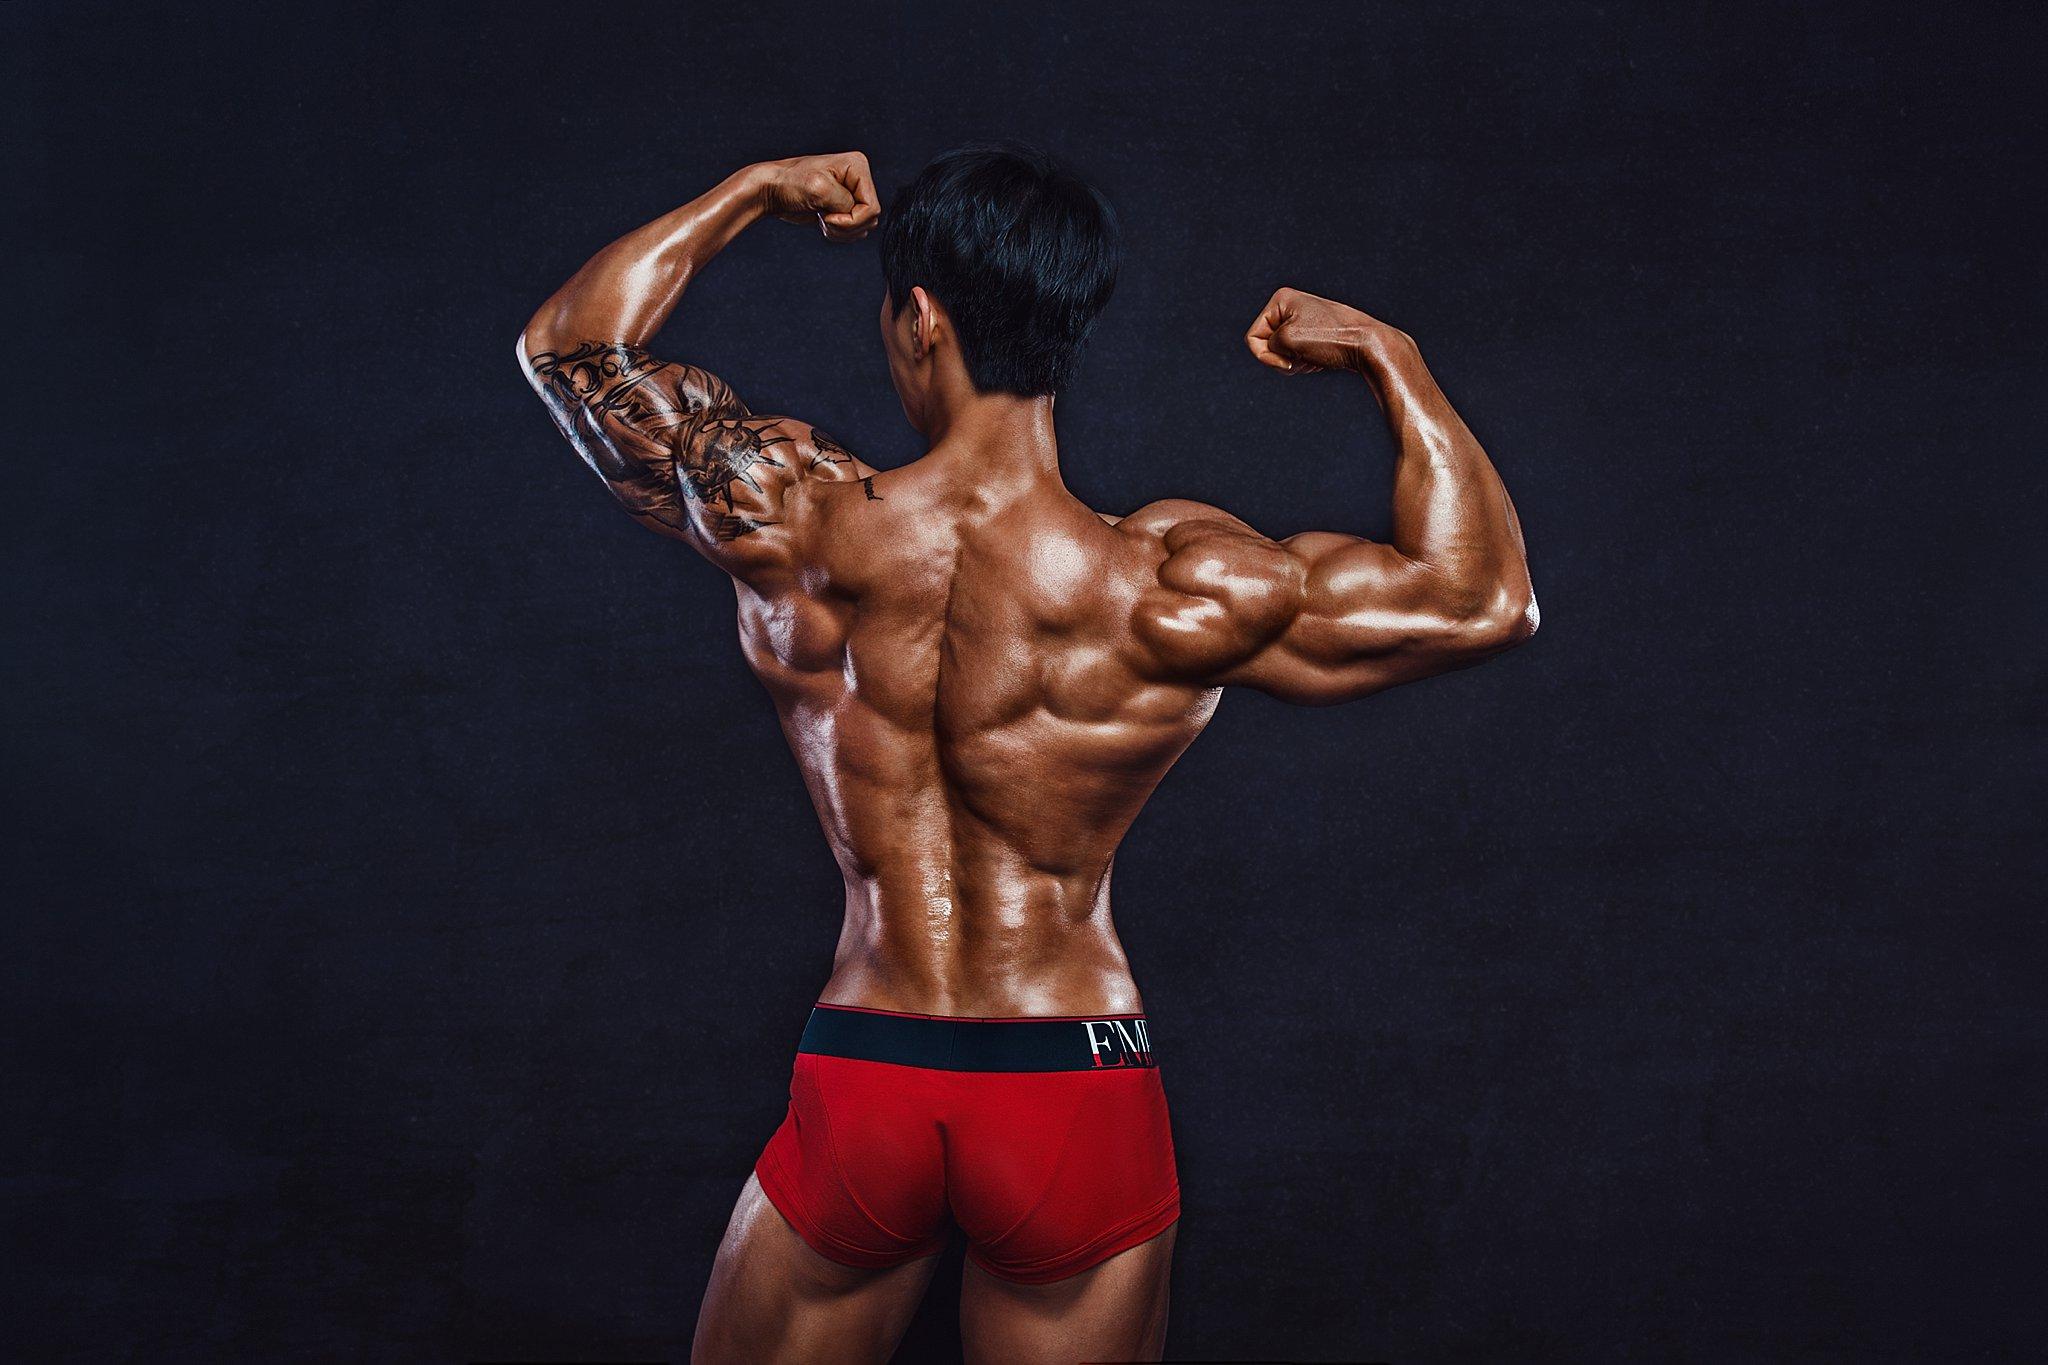 Australian fitness photographer